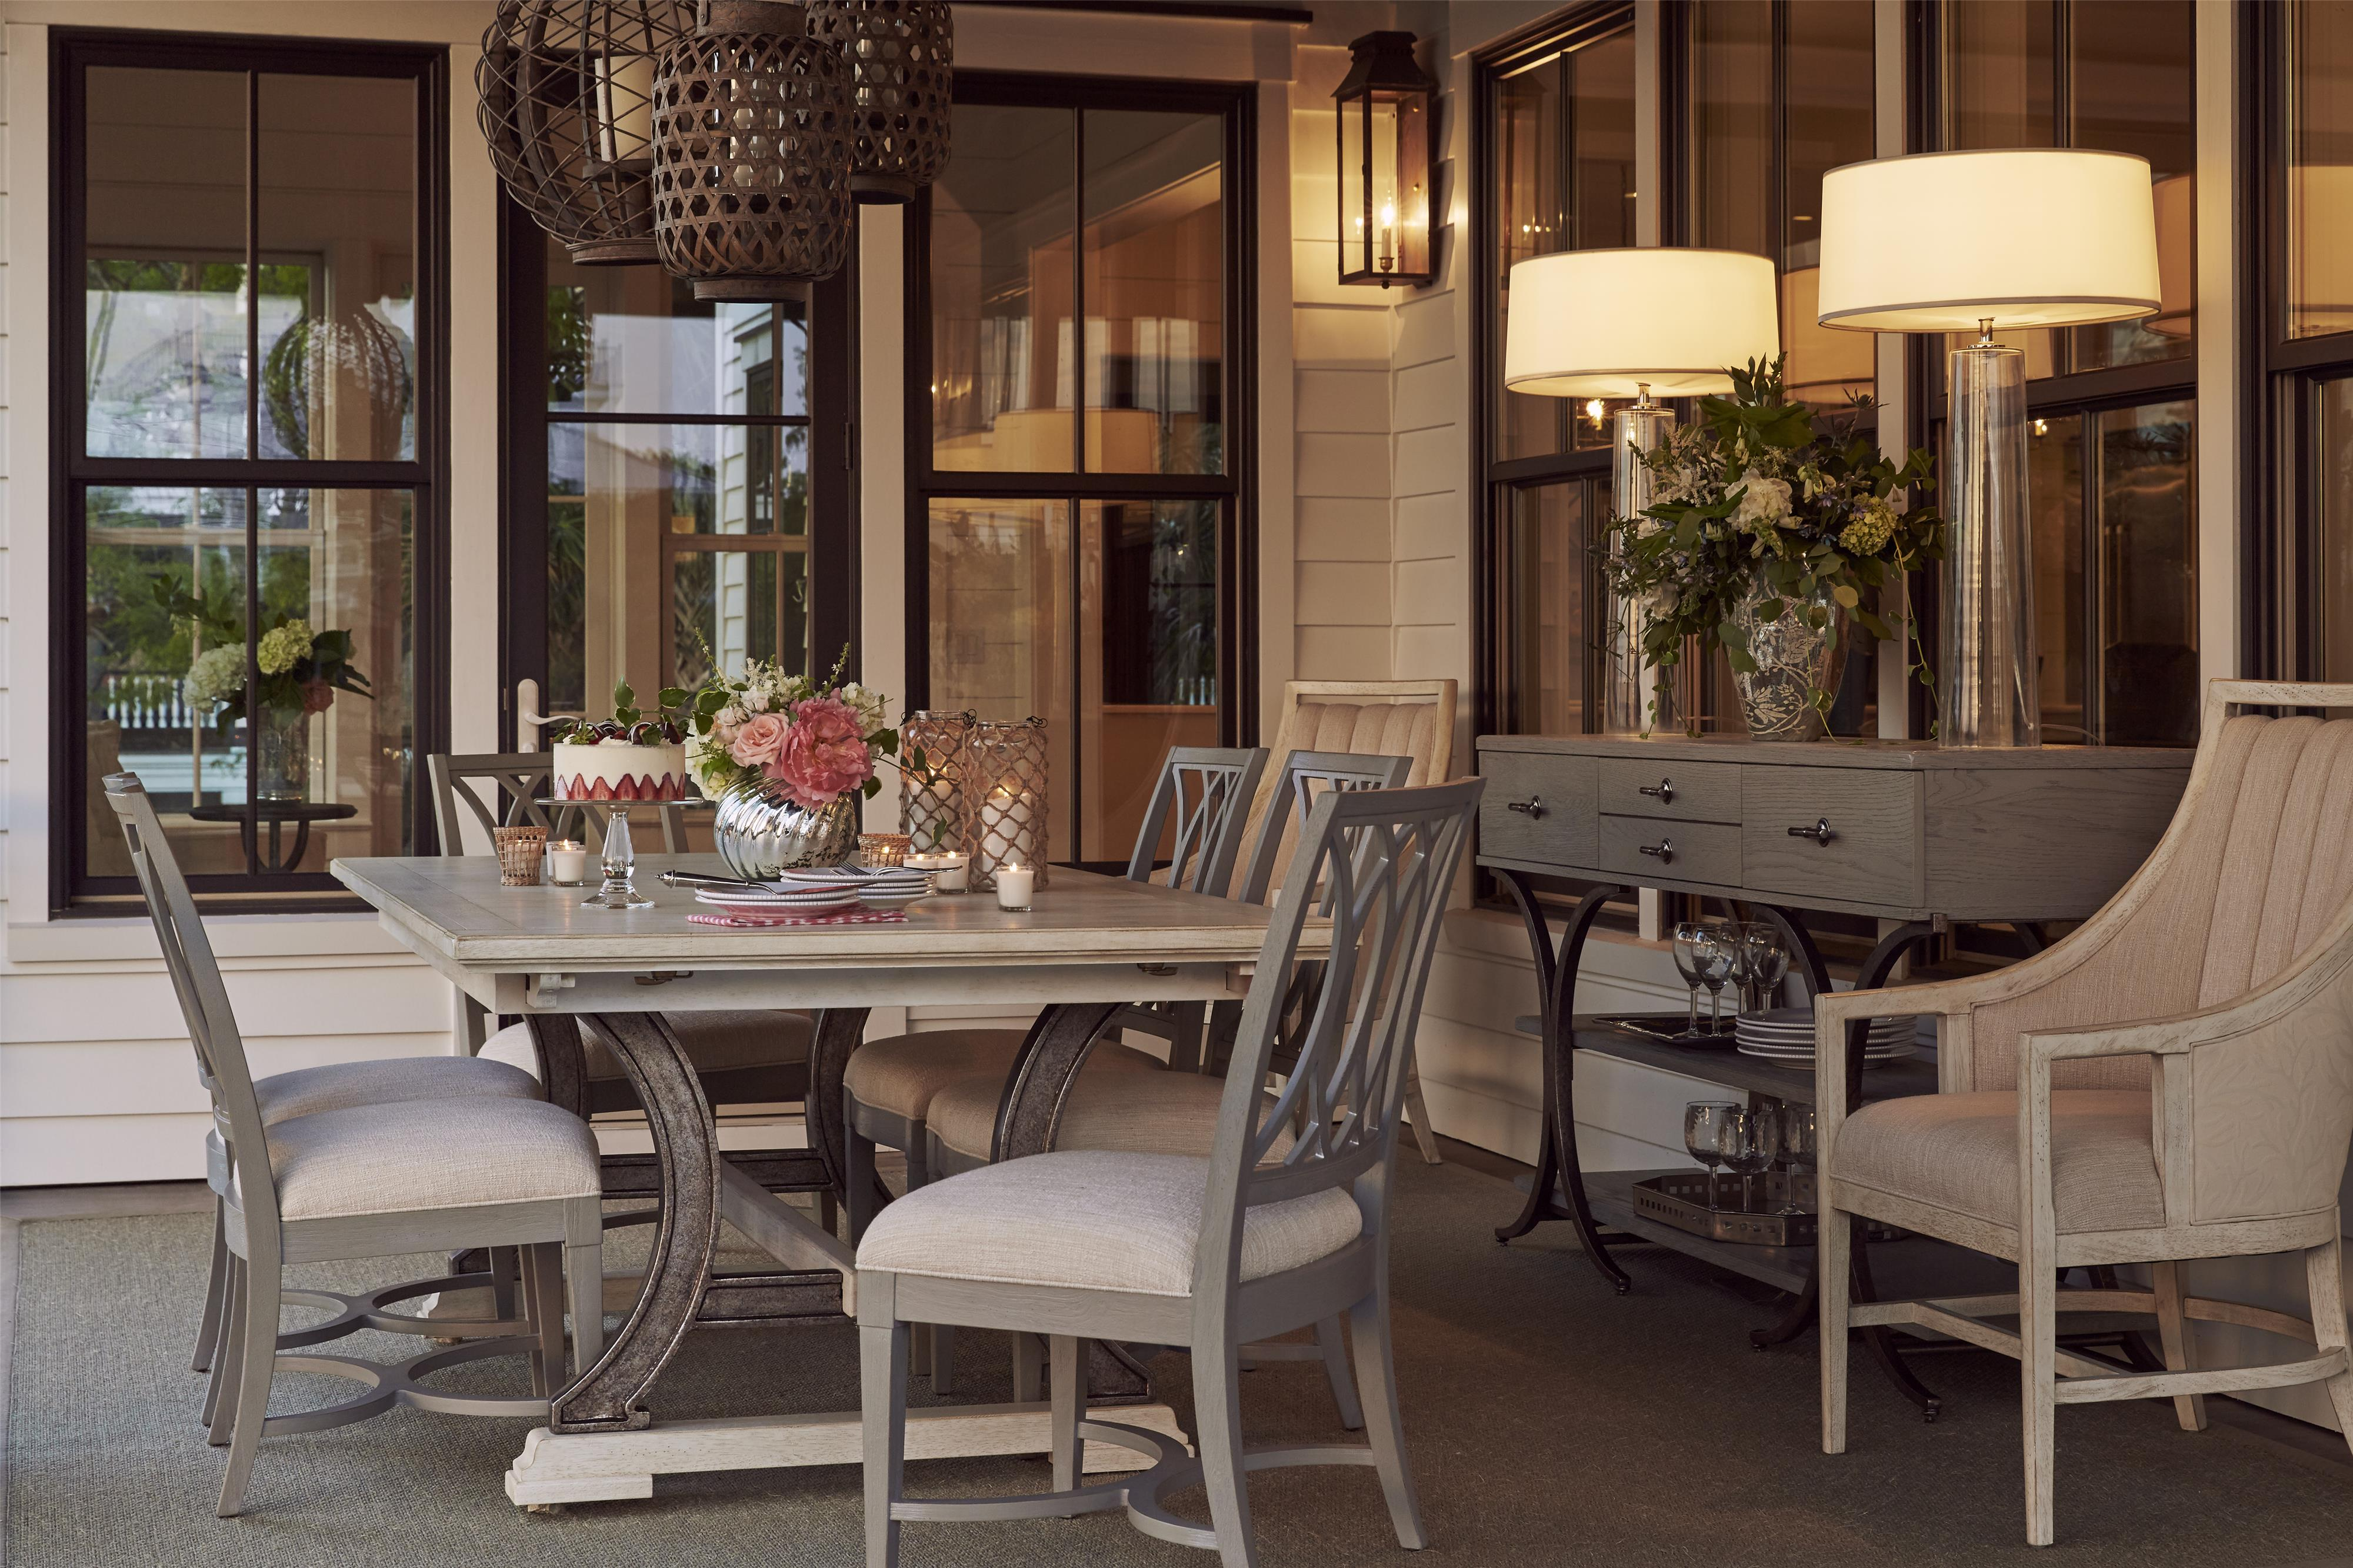 Coastal living resort 062 a by stanley furniture baer for Stanley furniture